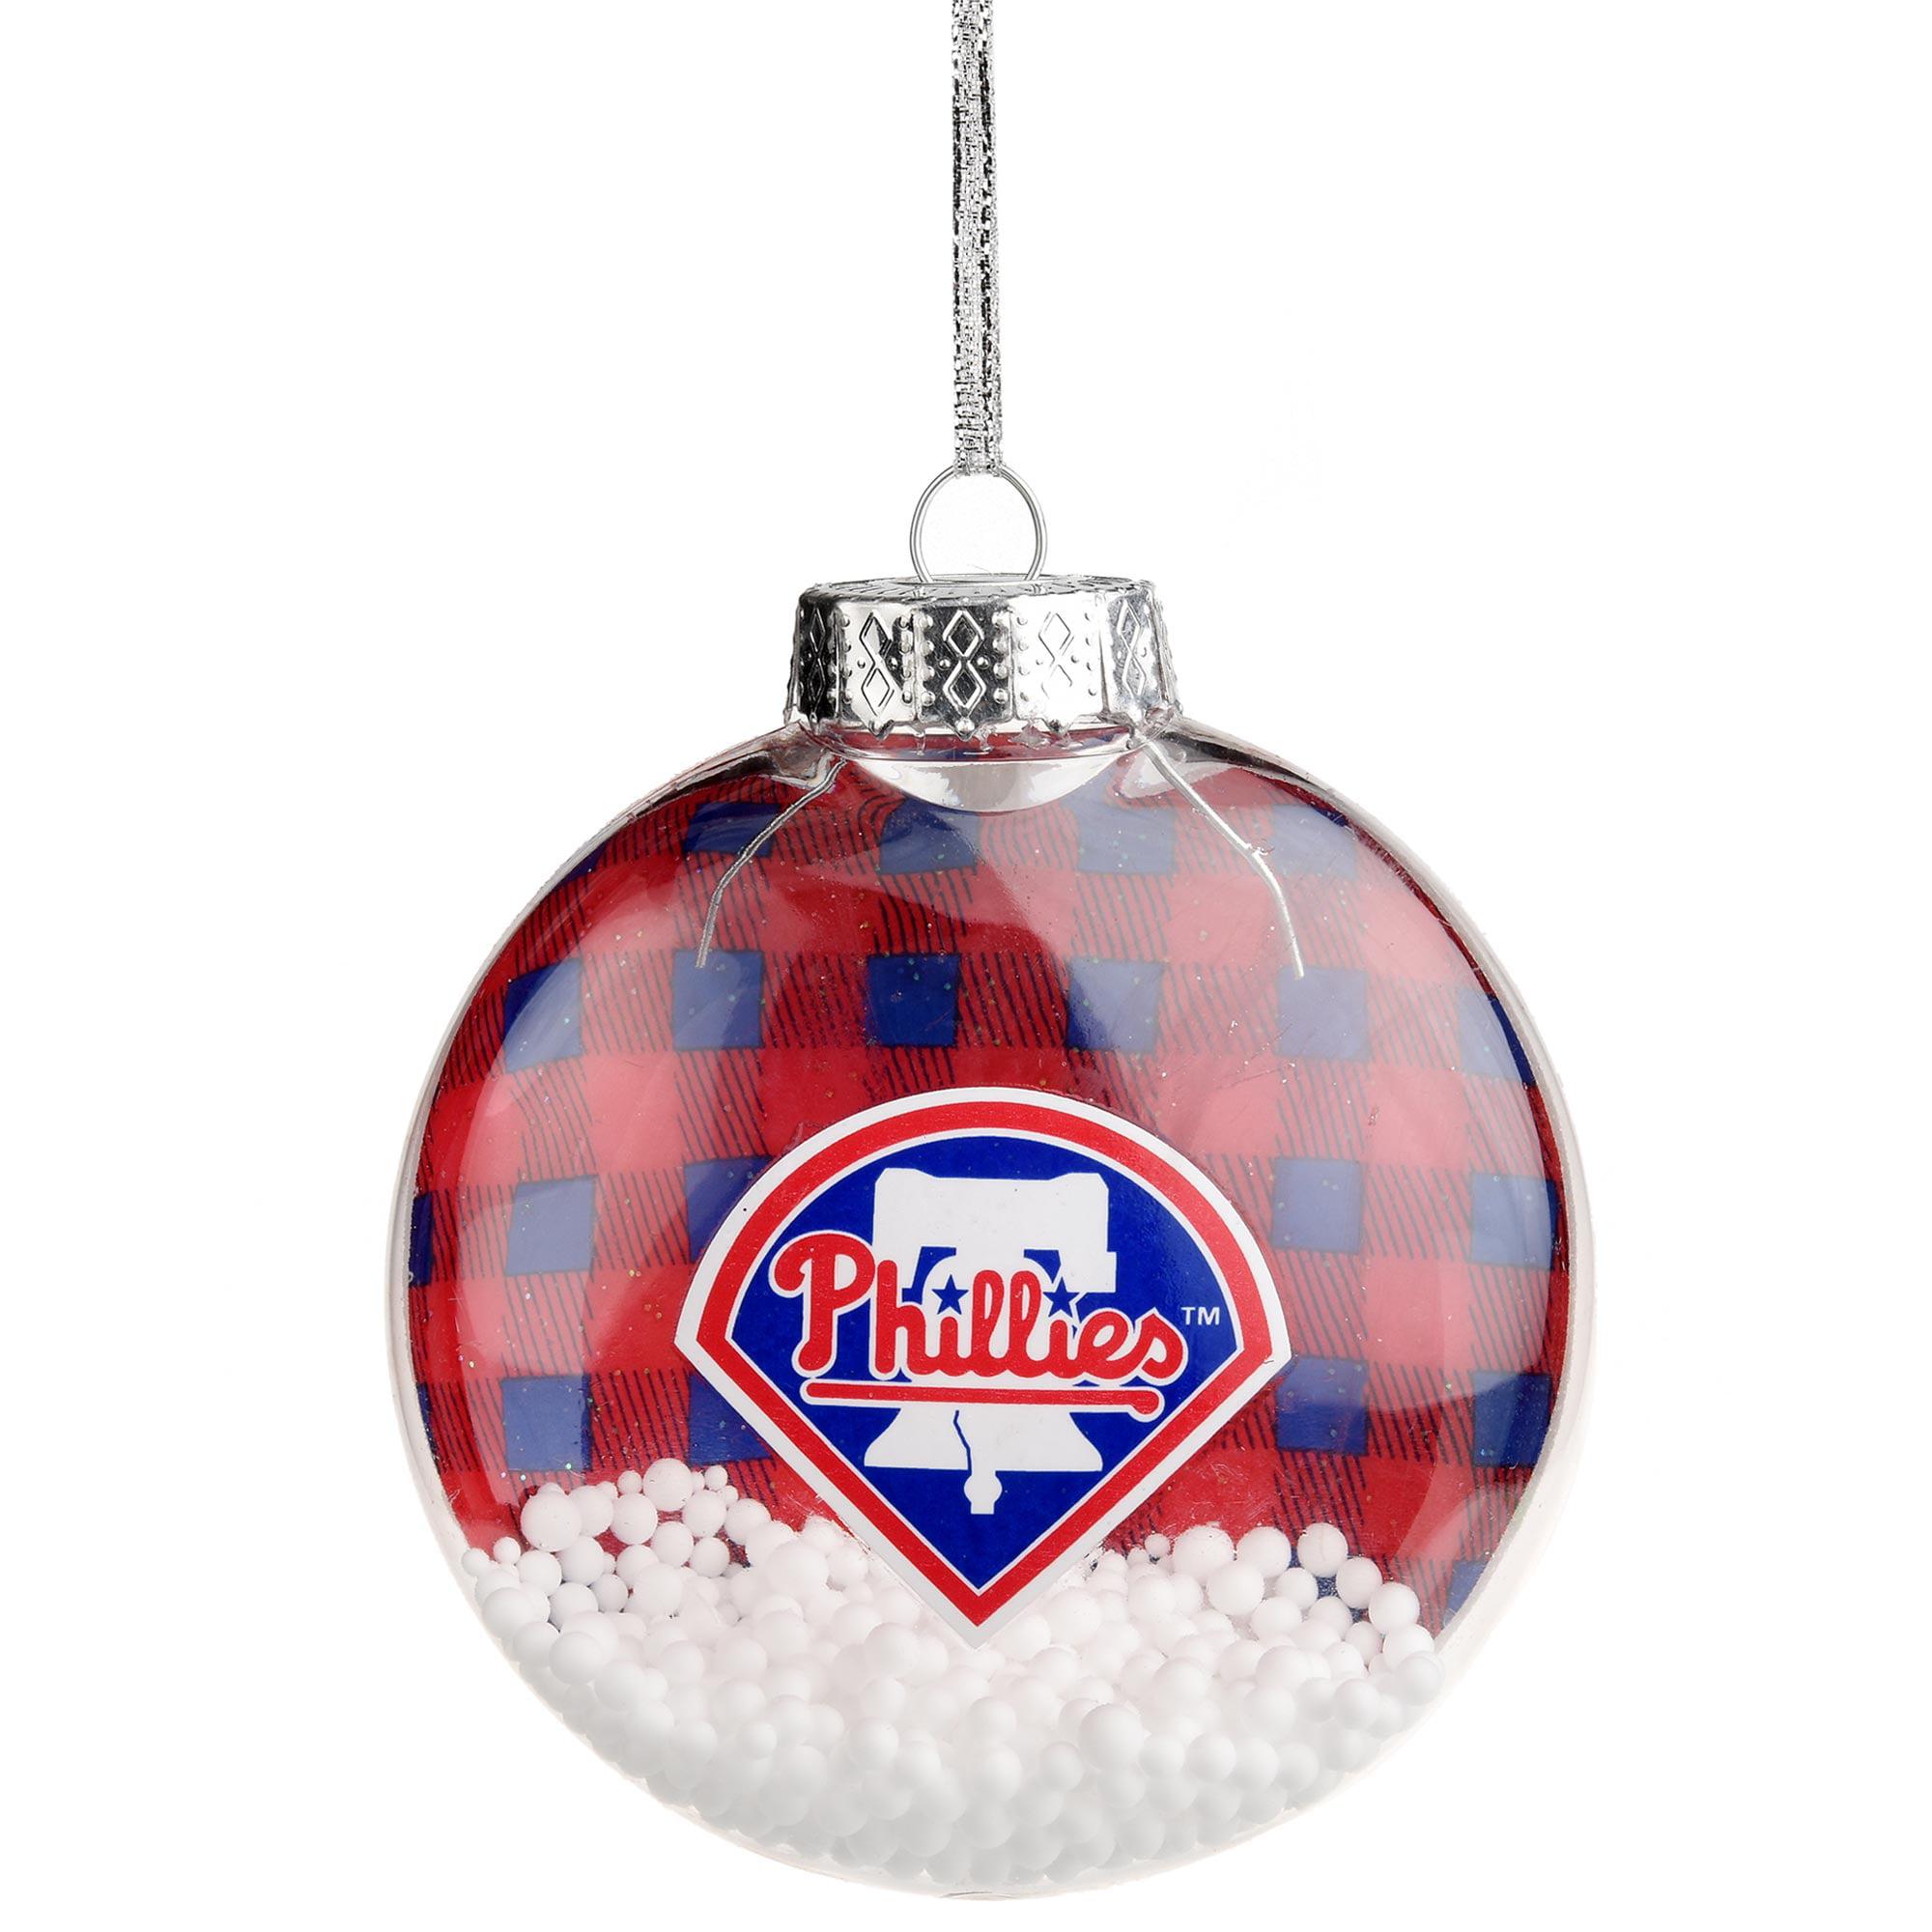 Philadelphia Phillies Flannel Ornament - No Size